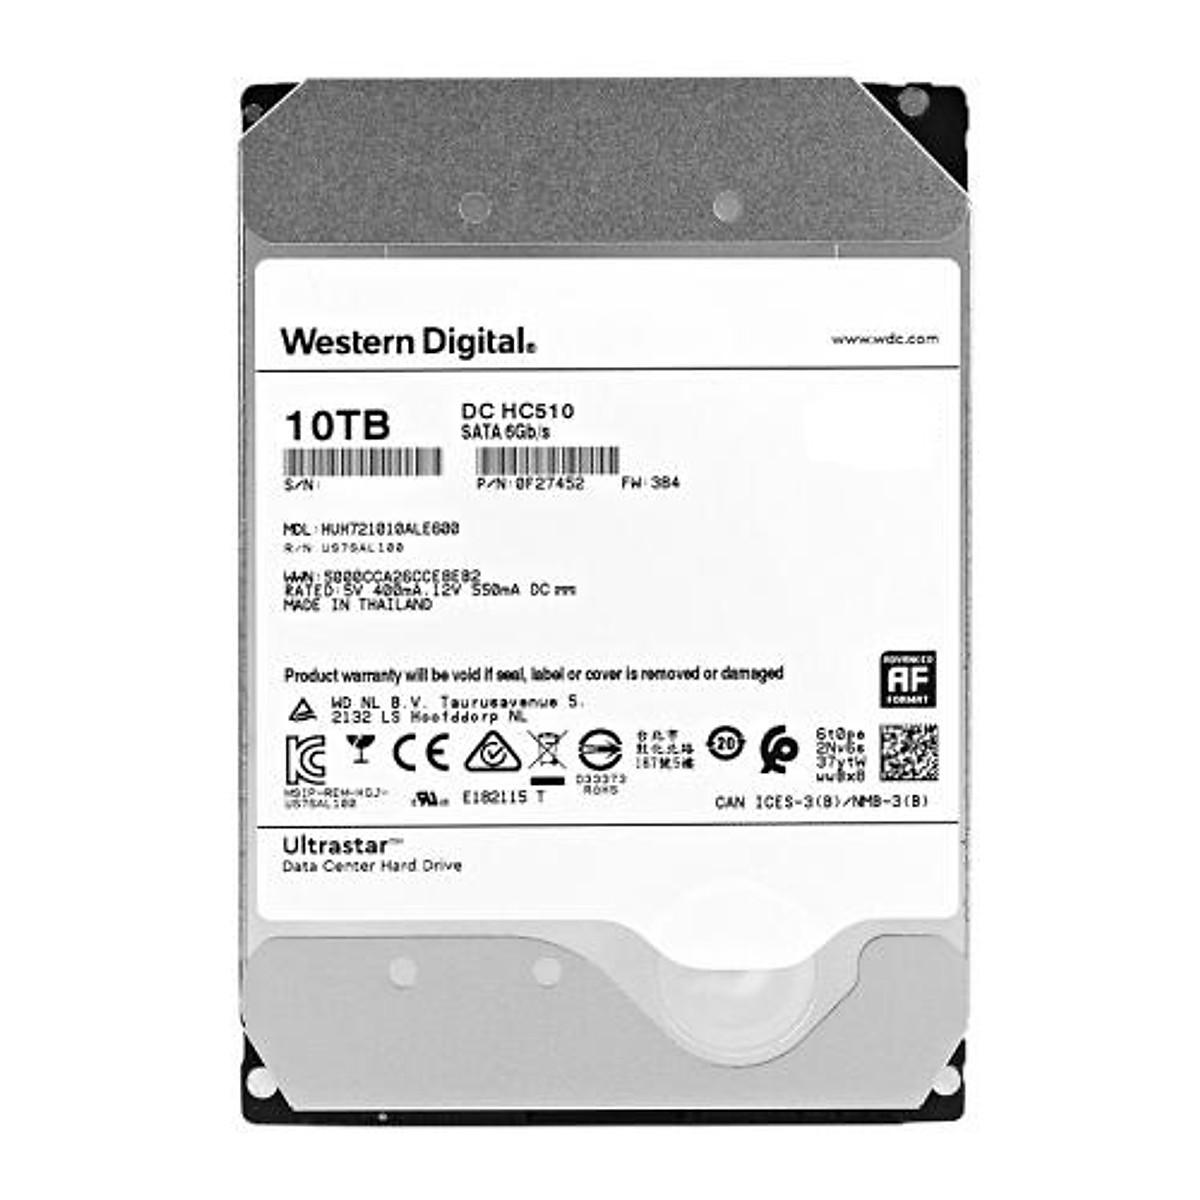 Ổ cứng HDD Western Digital Ultrastar 10TB 3.5 inch Sata 3  – Hàng Nhập Khẩu